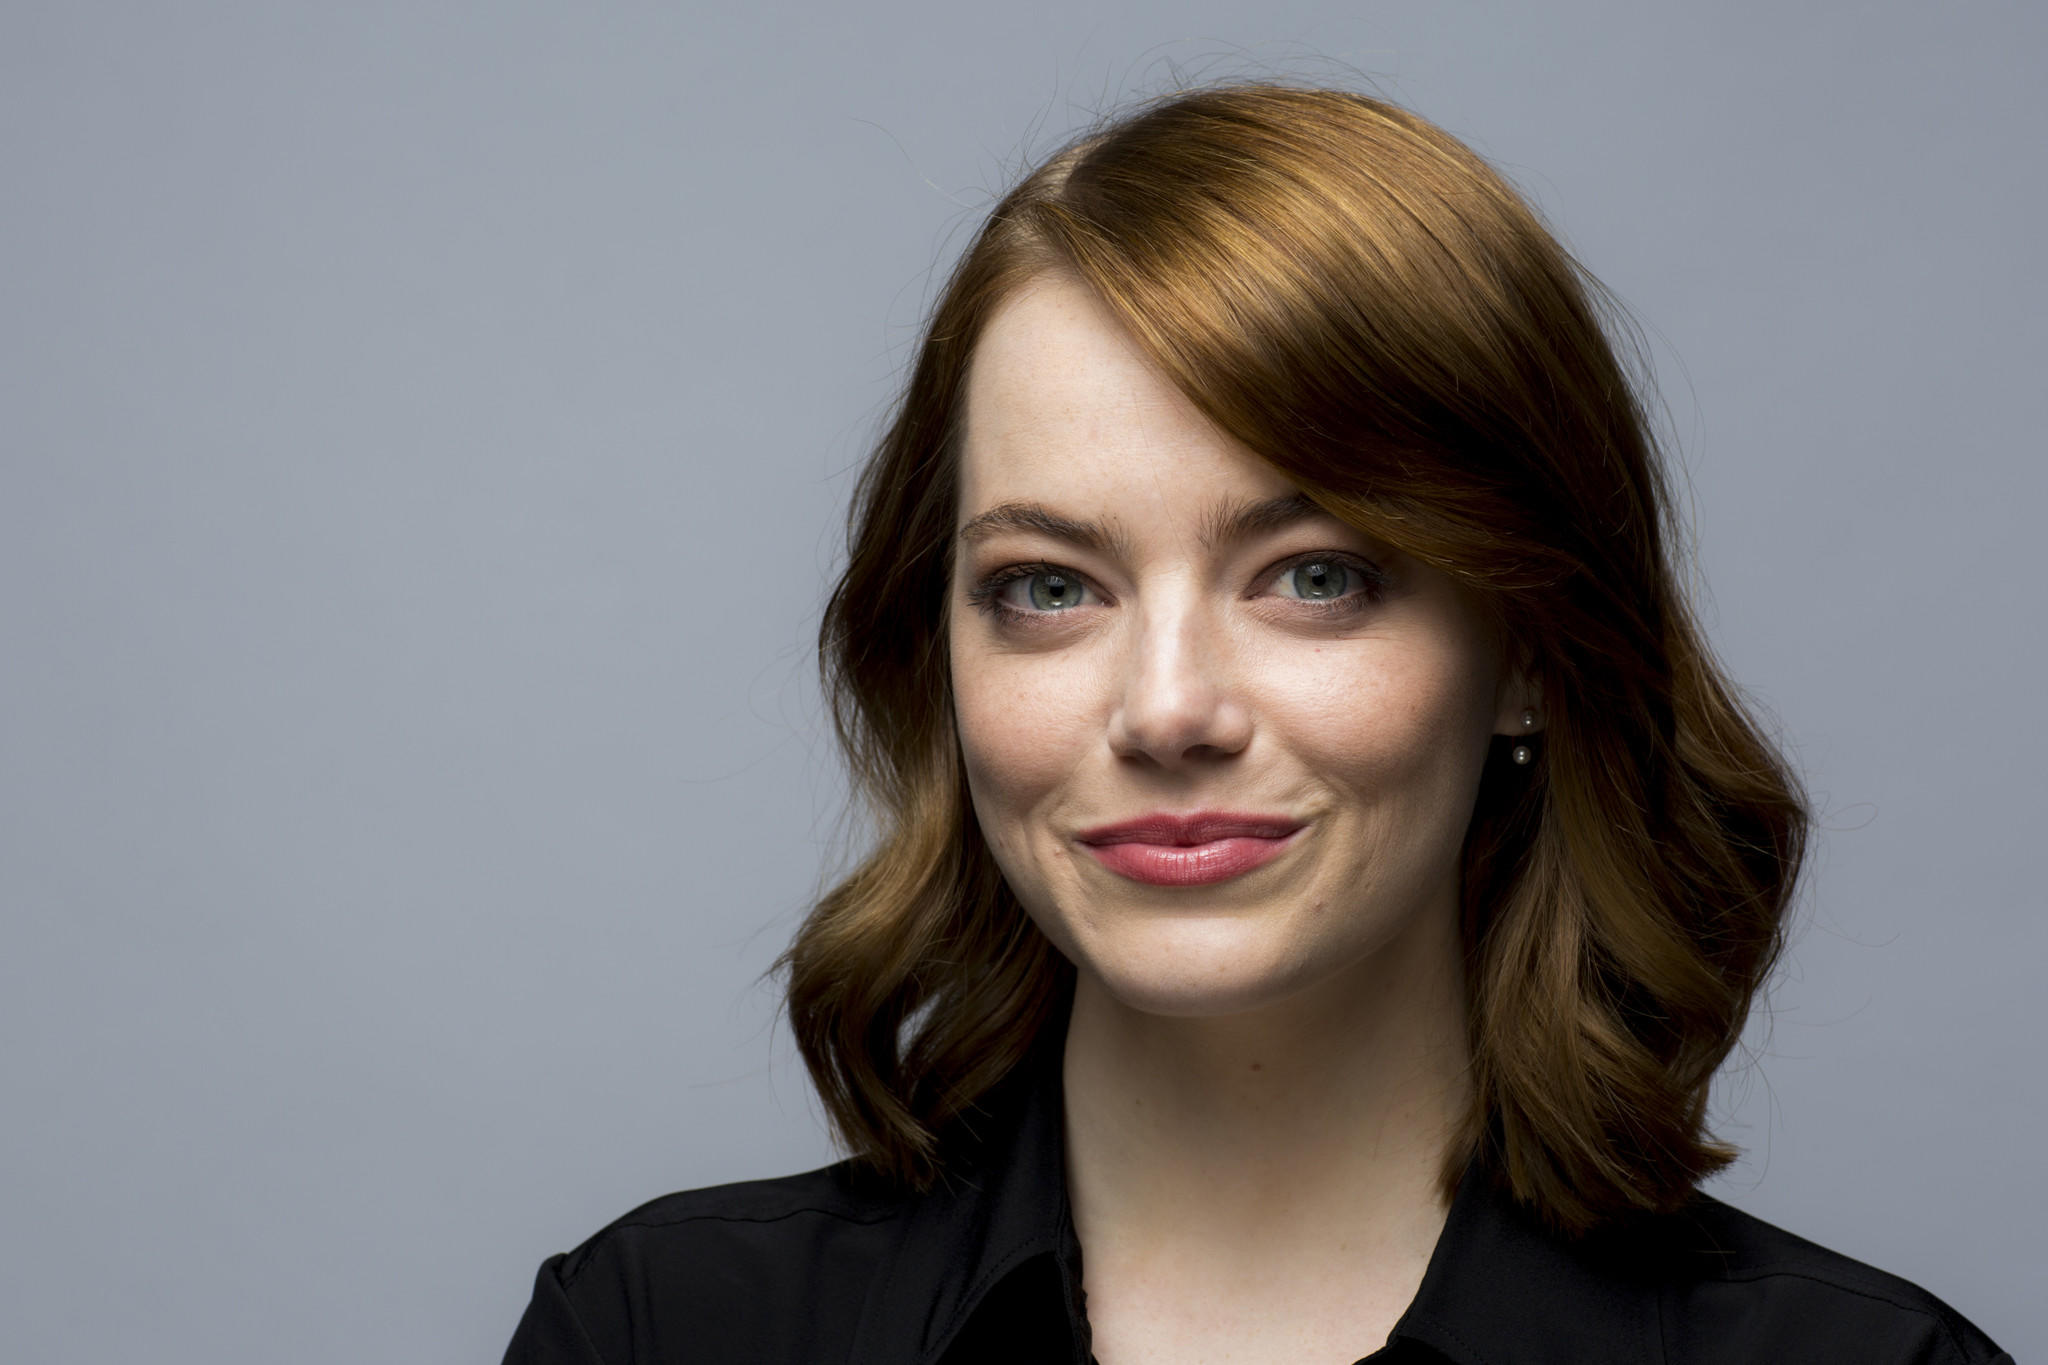 Emma Stone (Jay L. Clendenin / Los Angeles Times)